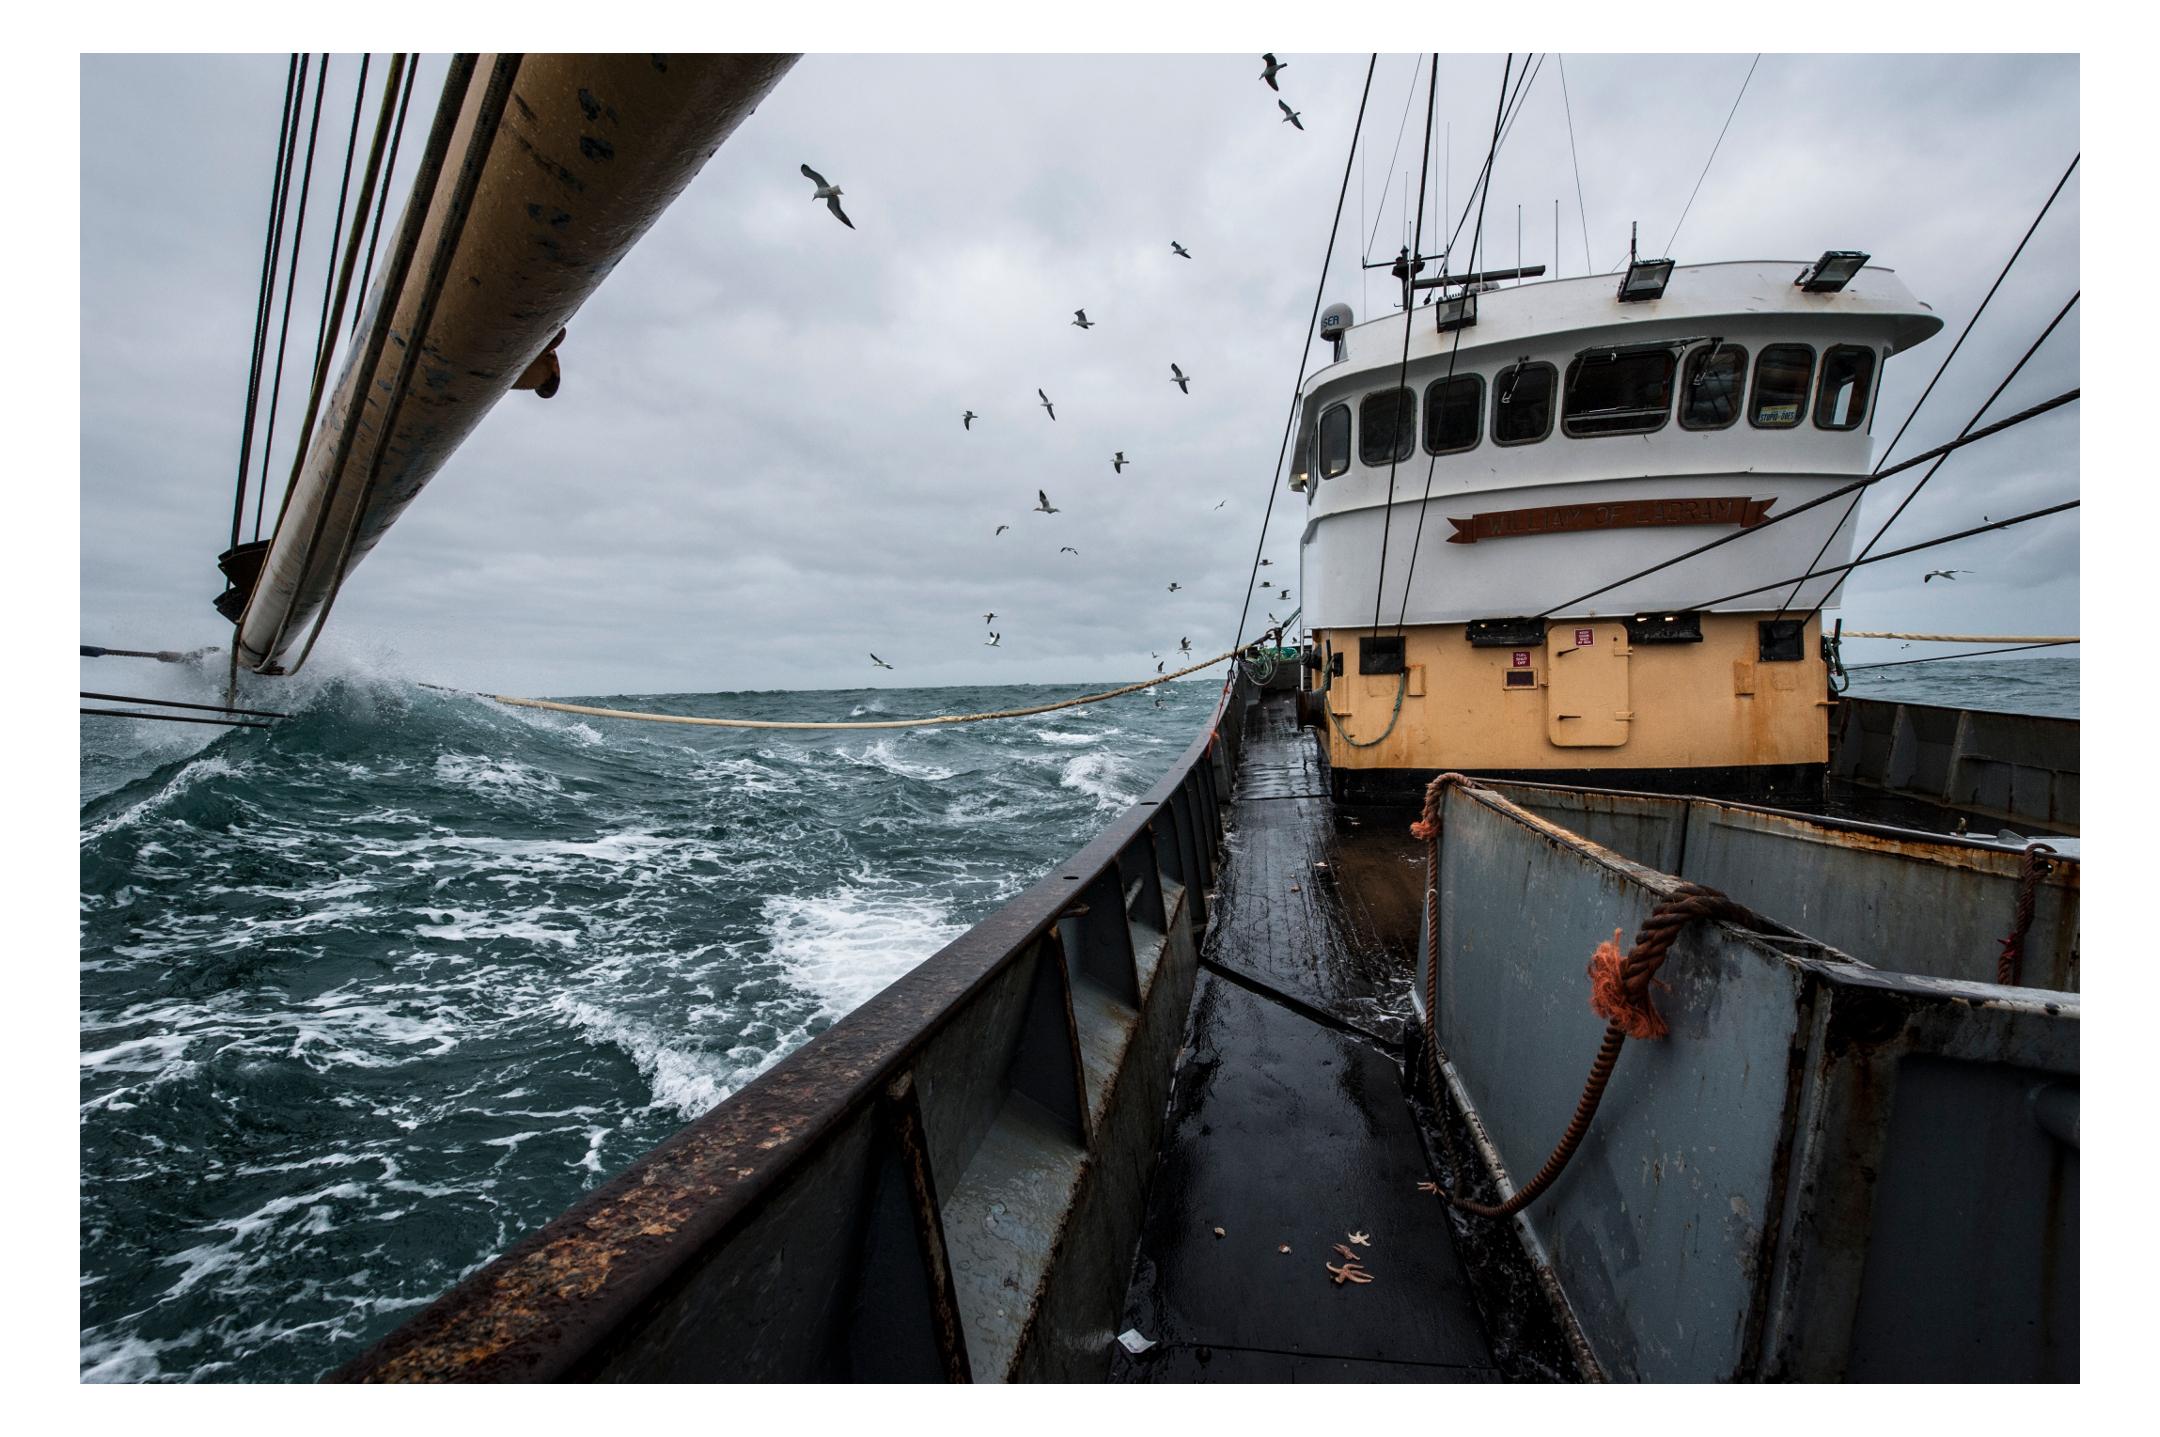 waterdance_beam_trawlers_2.jpg